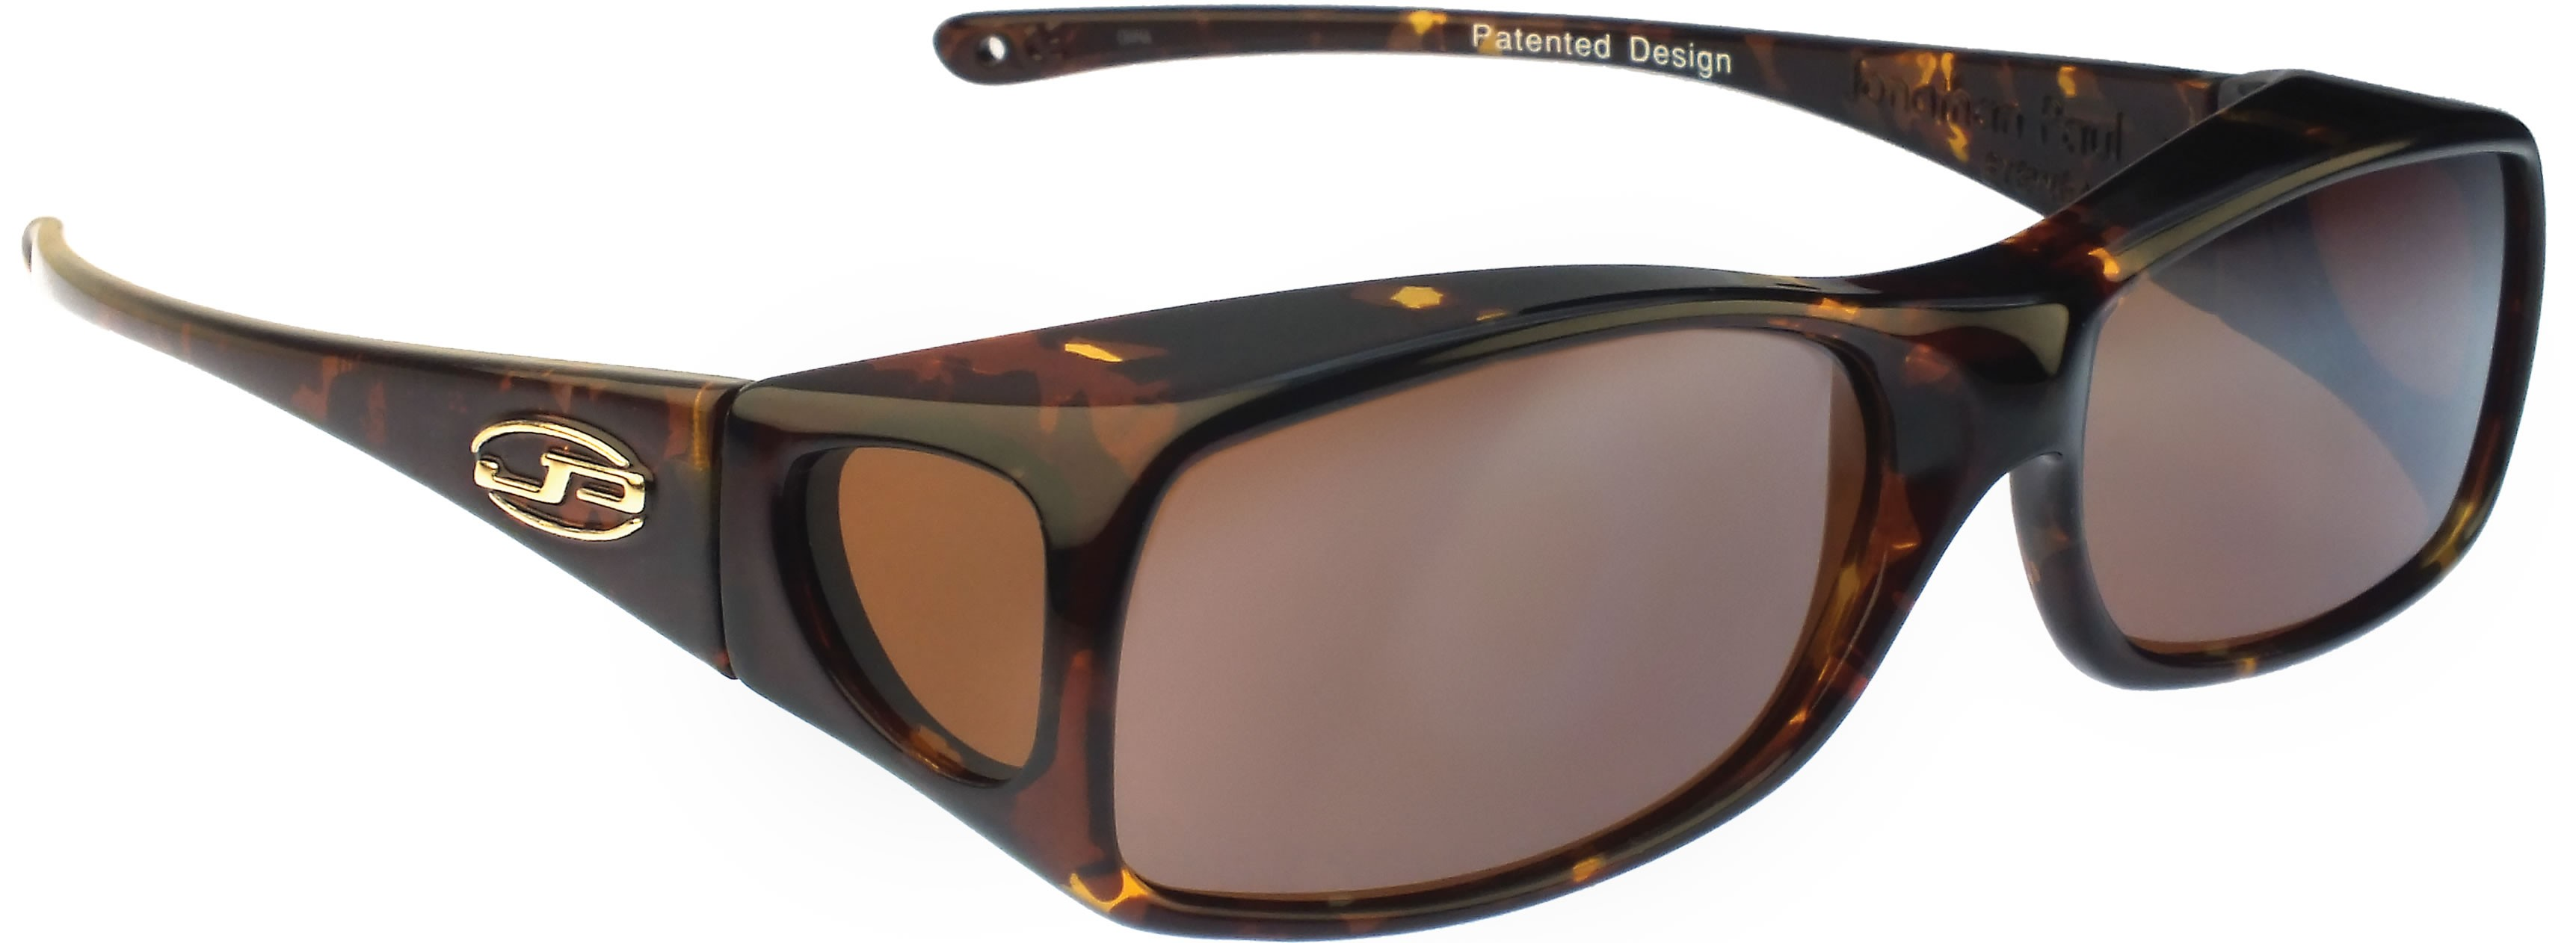 724e2466d4 Fitovers Eyewear Aria Sunglasses